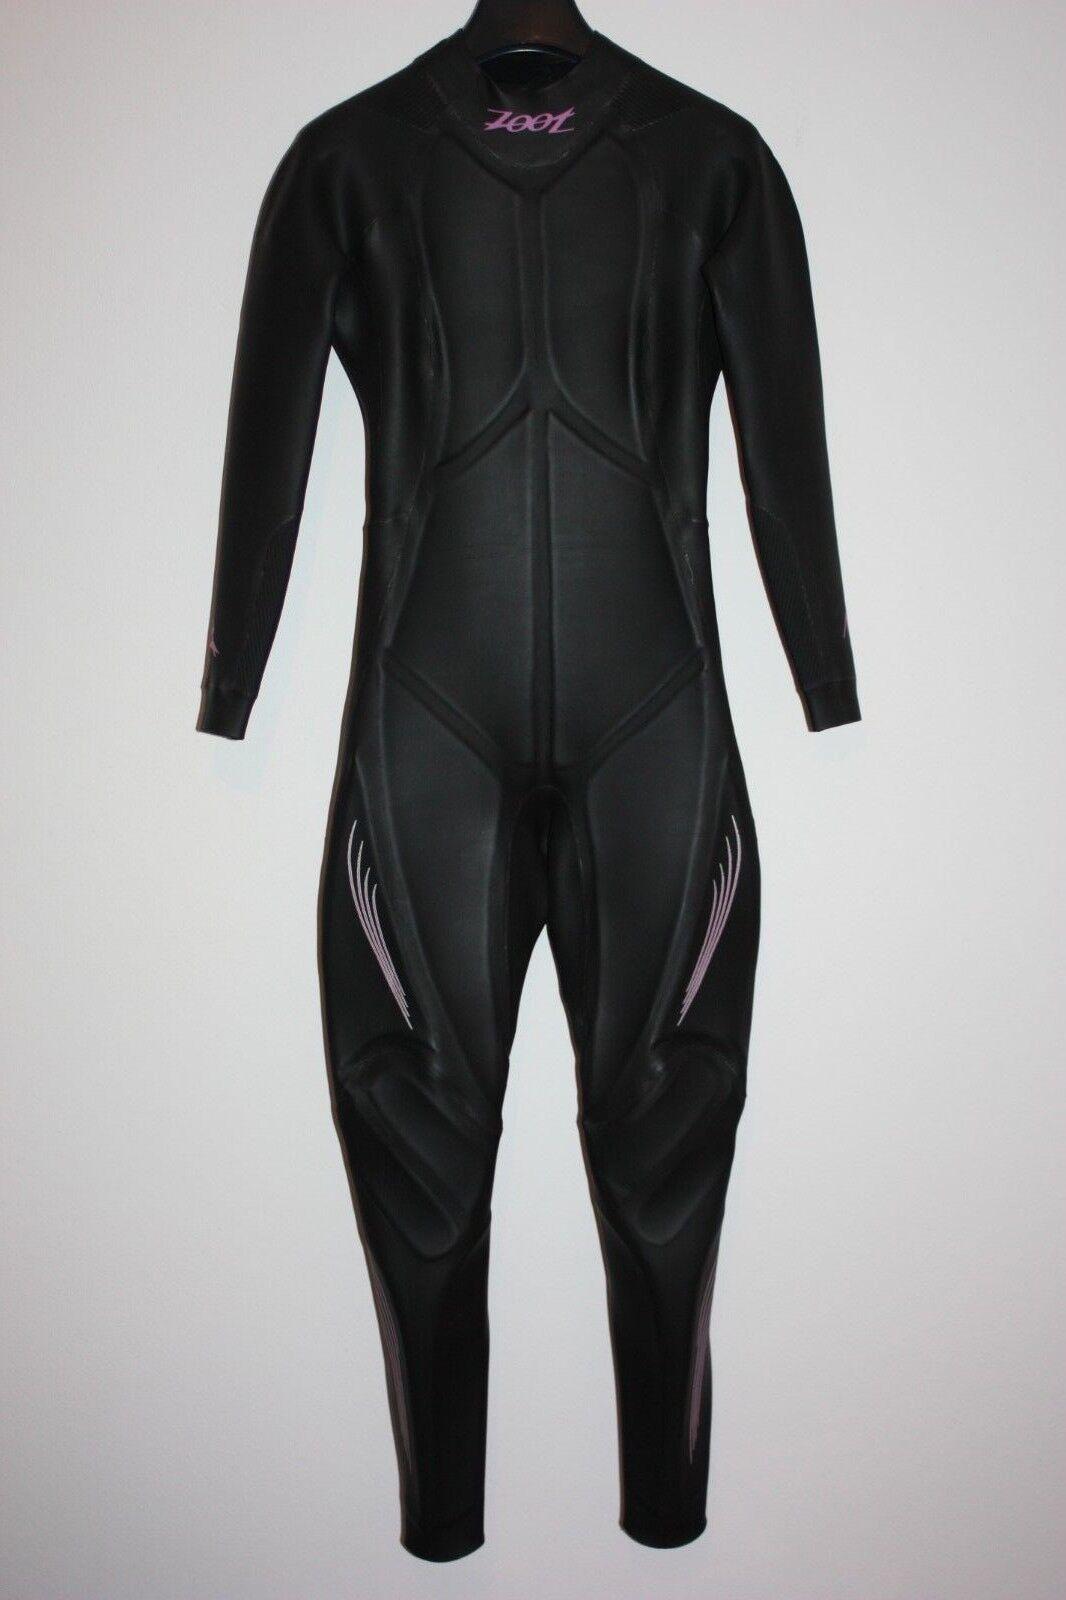 Zoot Zenith 2.0 Triathlon Neoprenanzug Gr.M Wetsuit Wetsuit Wetsuit Orca Sailfish Xterra 2XU TYR 6be07b